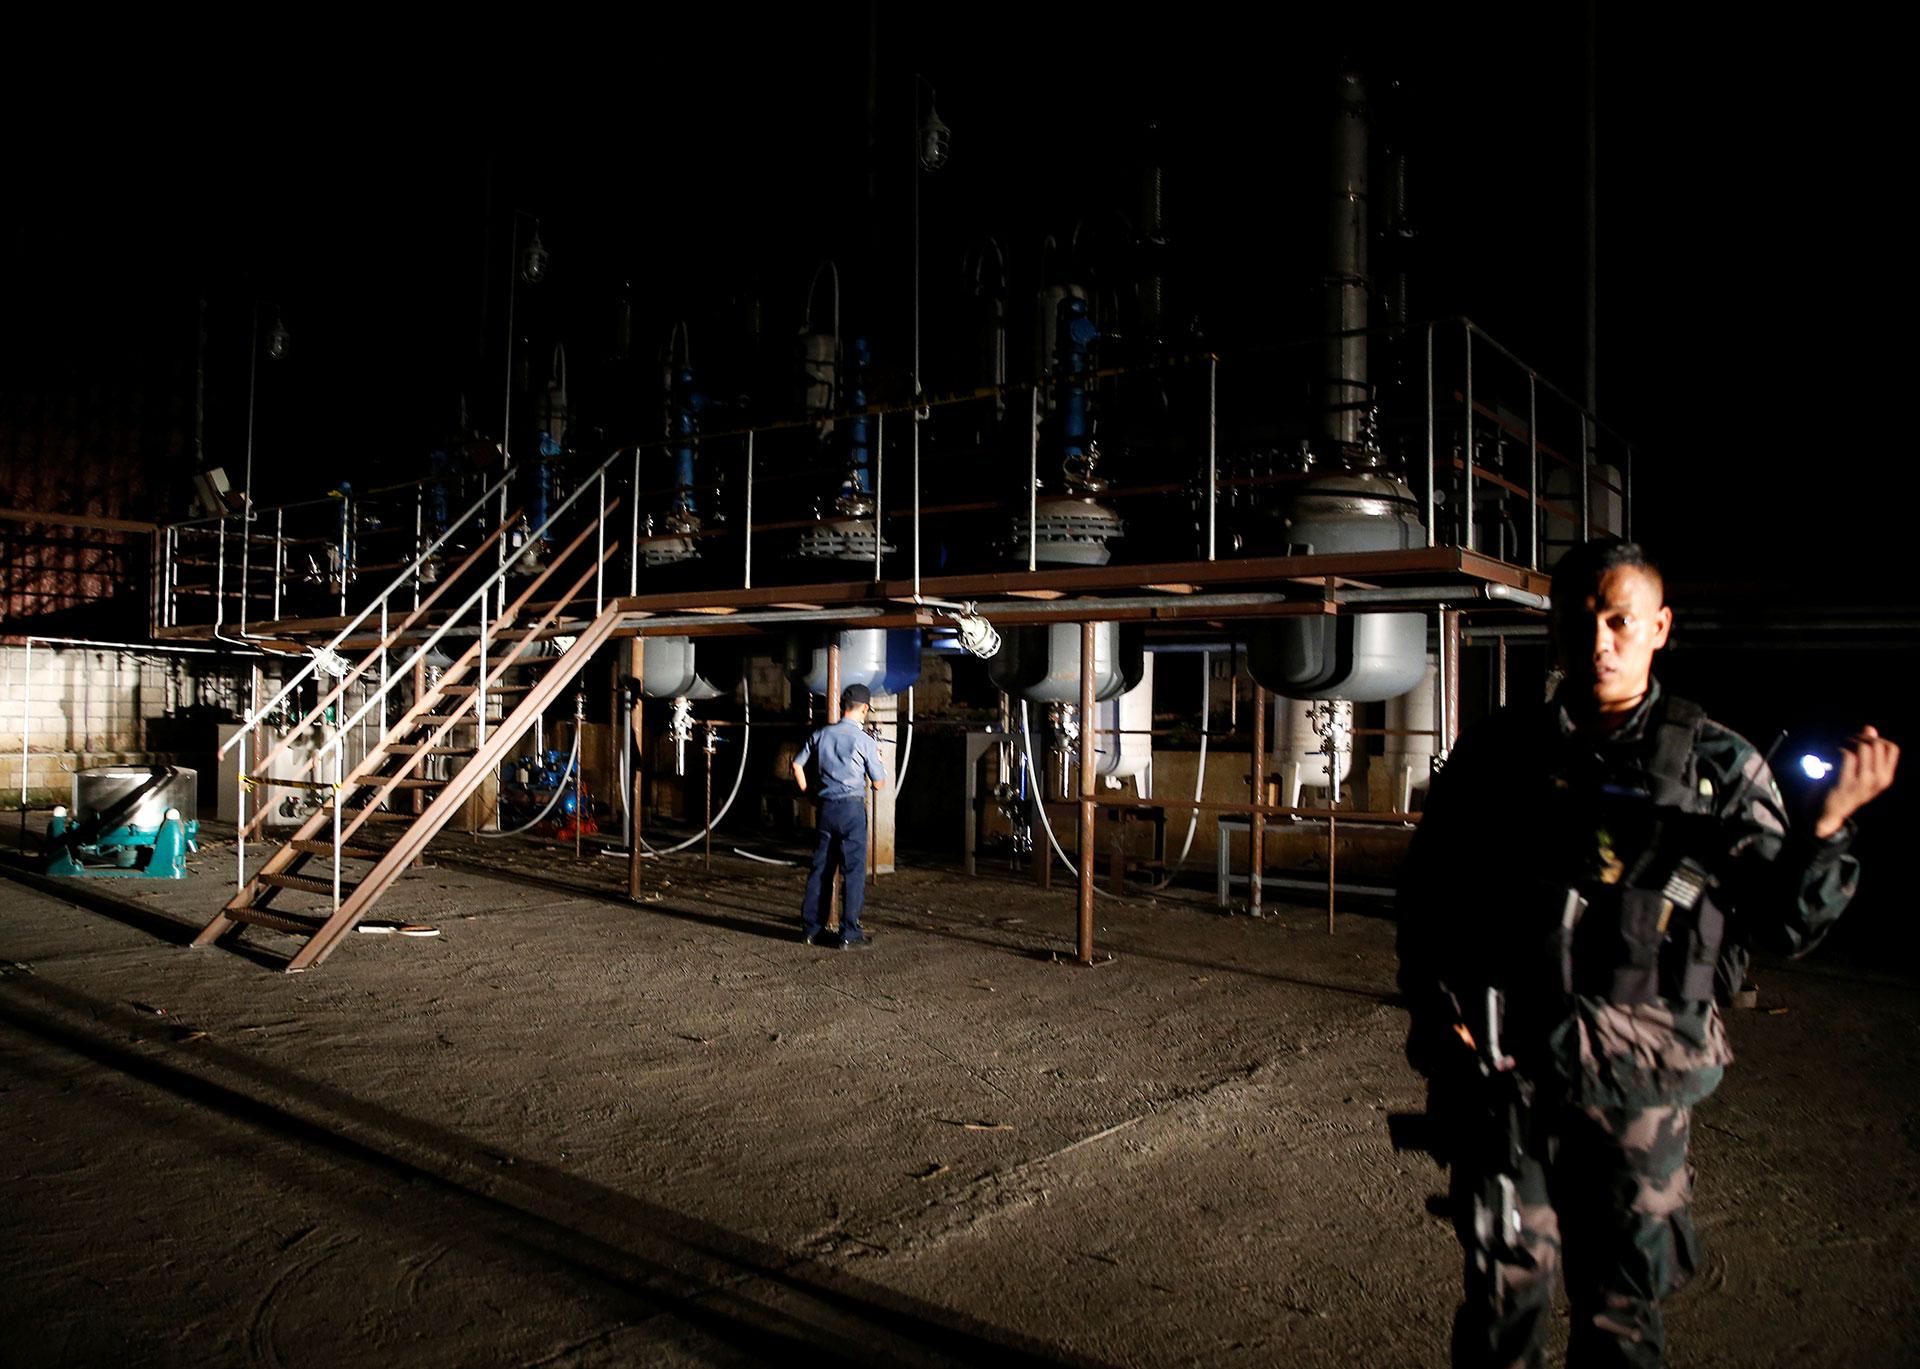 Chinese Meth Gangs Star in Philippines Drug Crisis